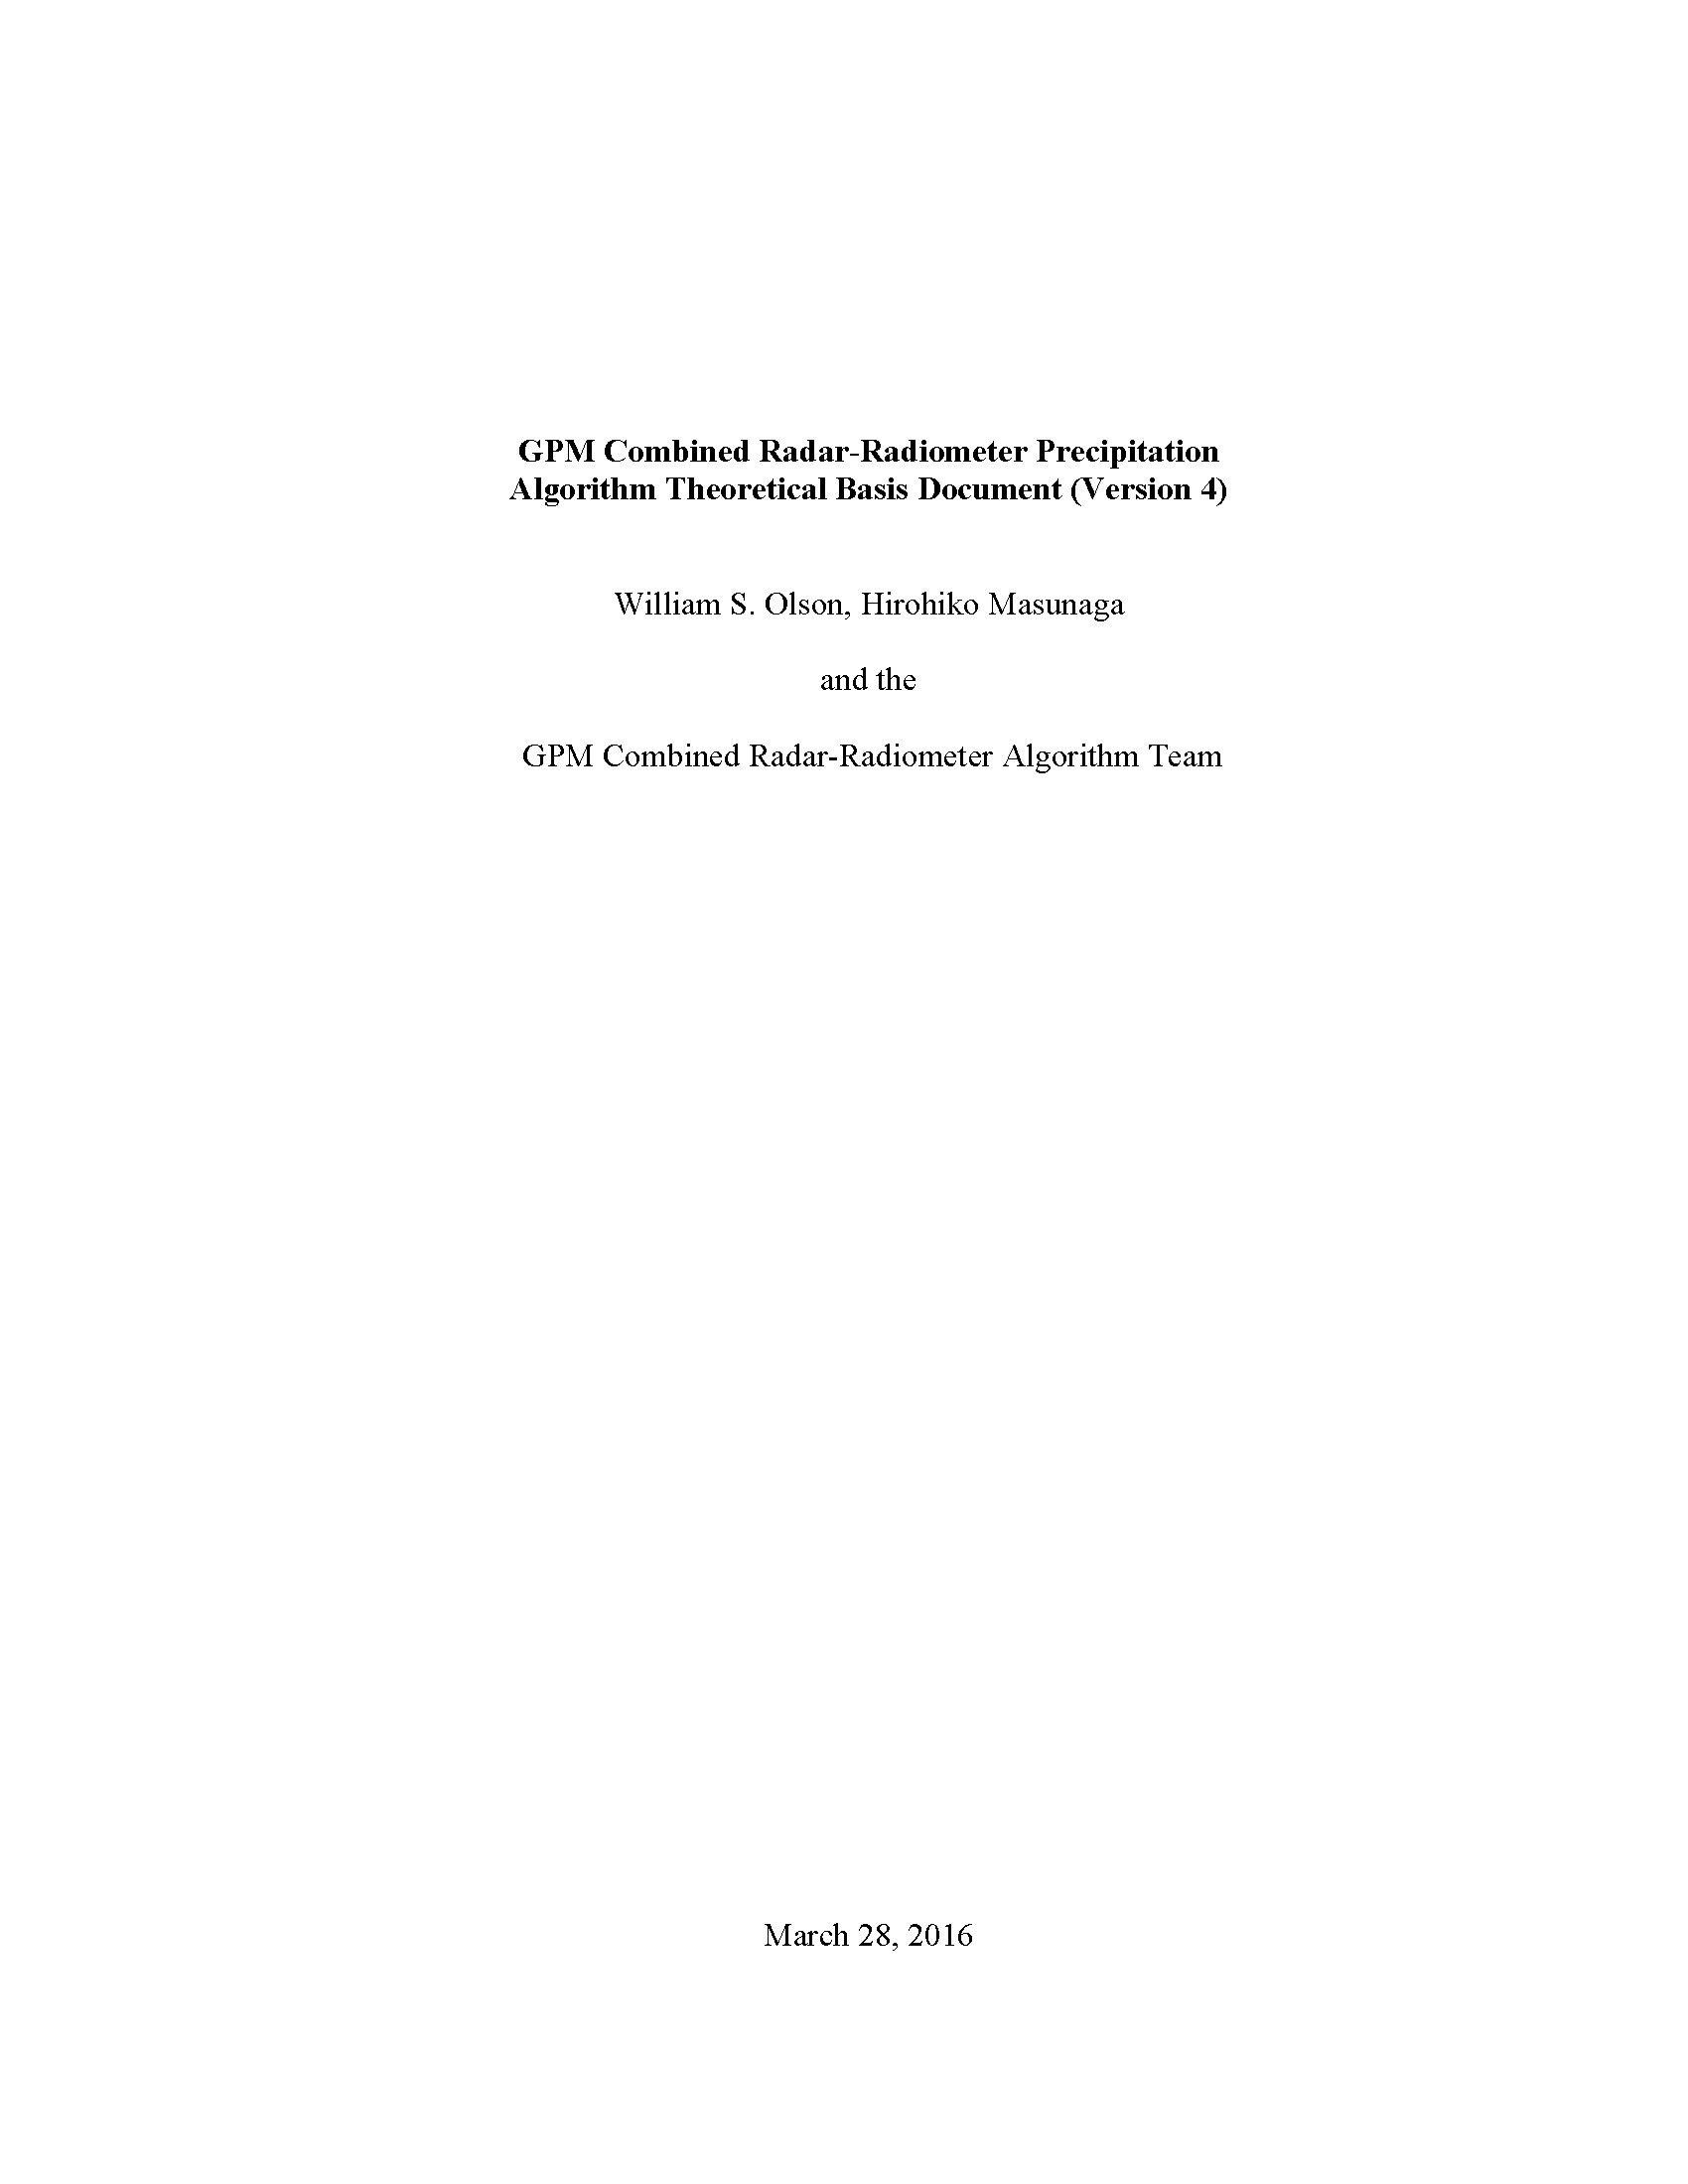 Download GPM Combined Radar-Radiometer Precipitation Algorithm Theoretical Basis Document (Version 4) [Loose Leaf] PDF